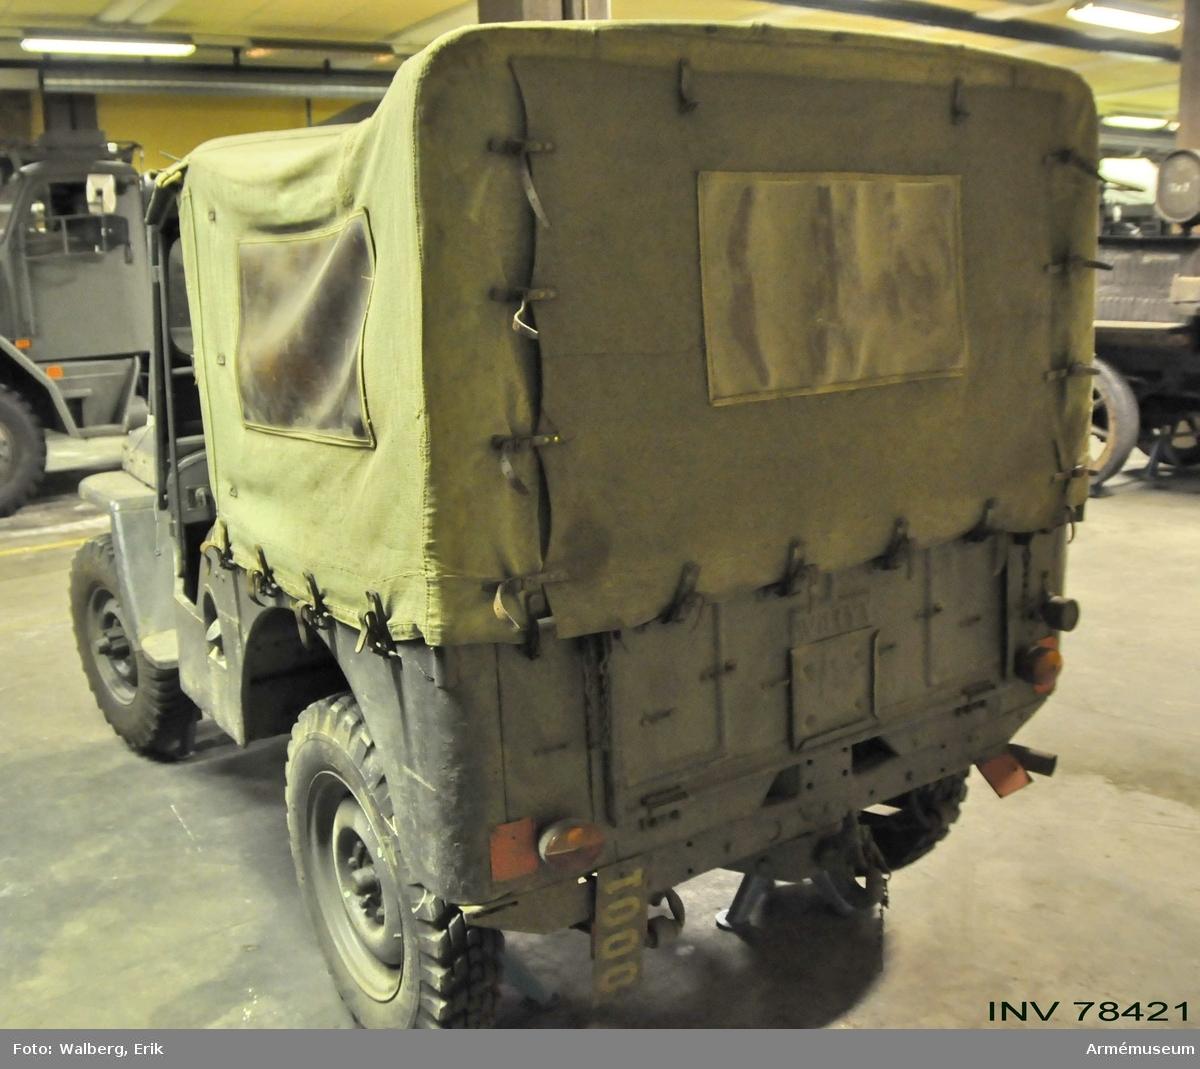 Grupp I VII. Gåva. Land S.  Jeep (lätt terrängbil) 1/2 tons-, Willys modell C J 3 A.